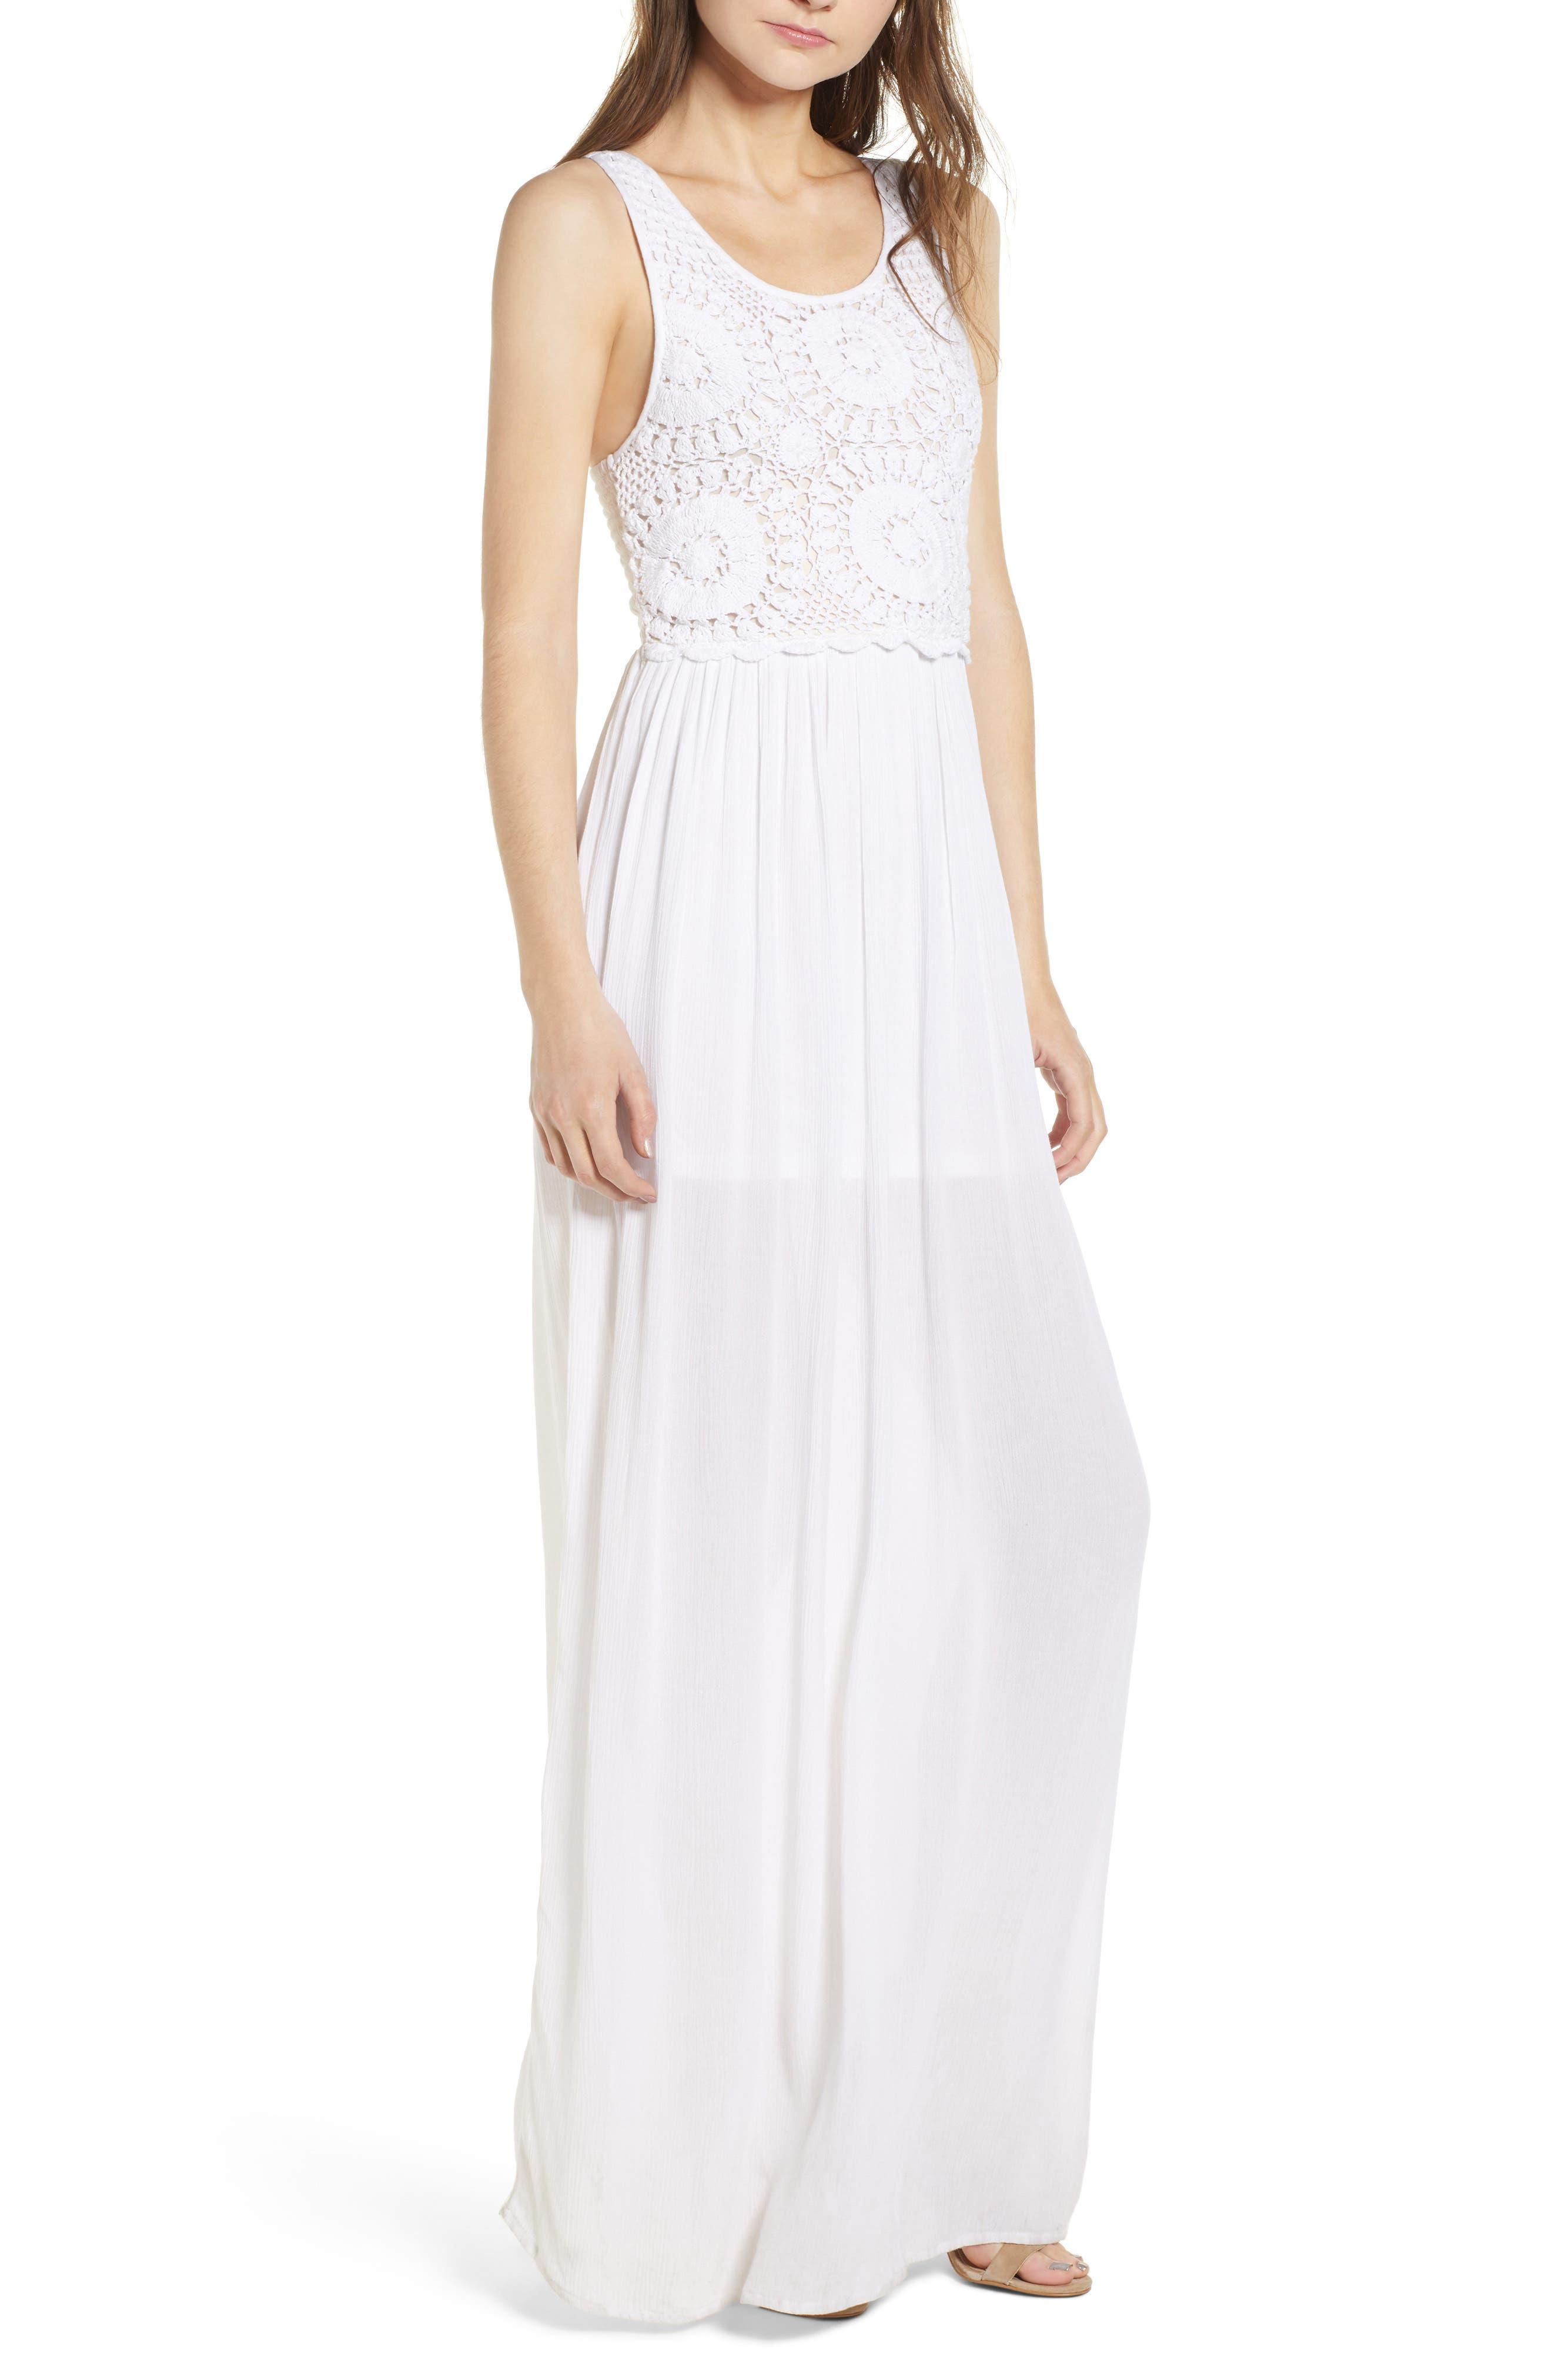 Bishop + Young Bora Bora Maxi Dress,                         Main,                         color, White